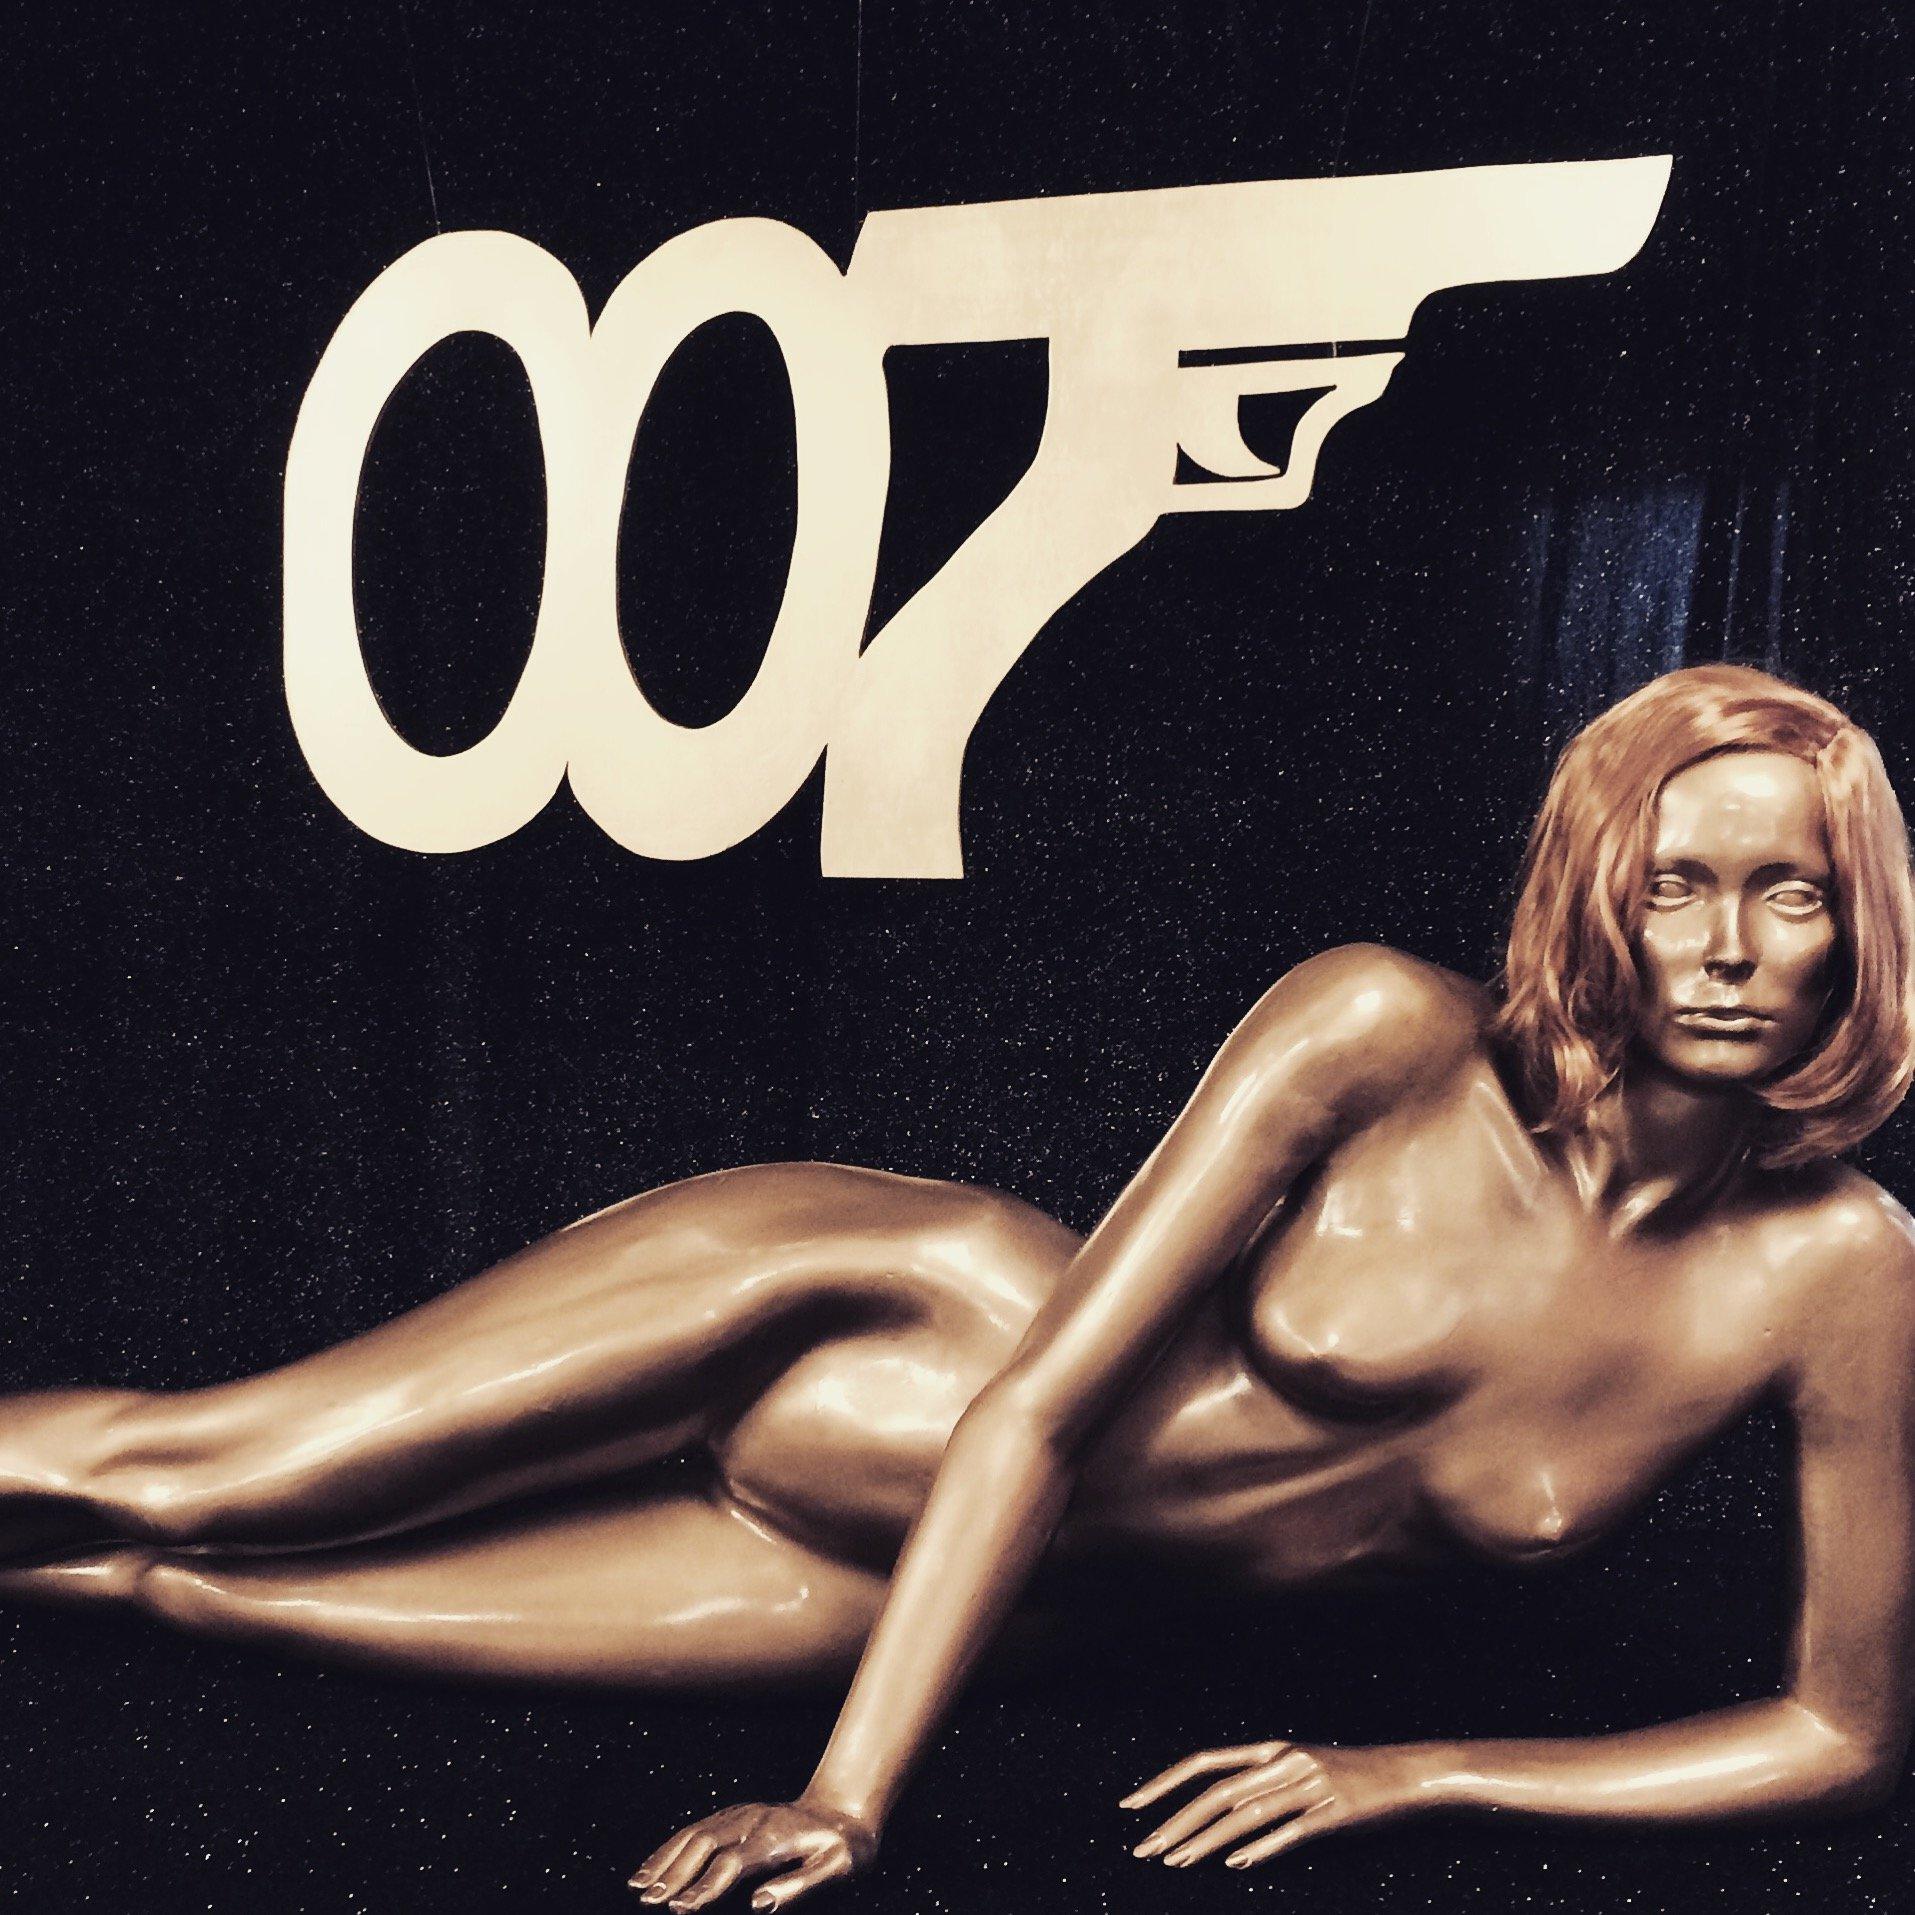 Casino Royale James Bond 007  gold sign